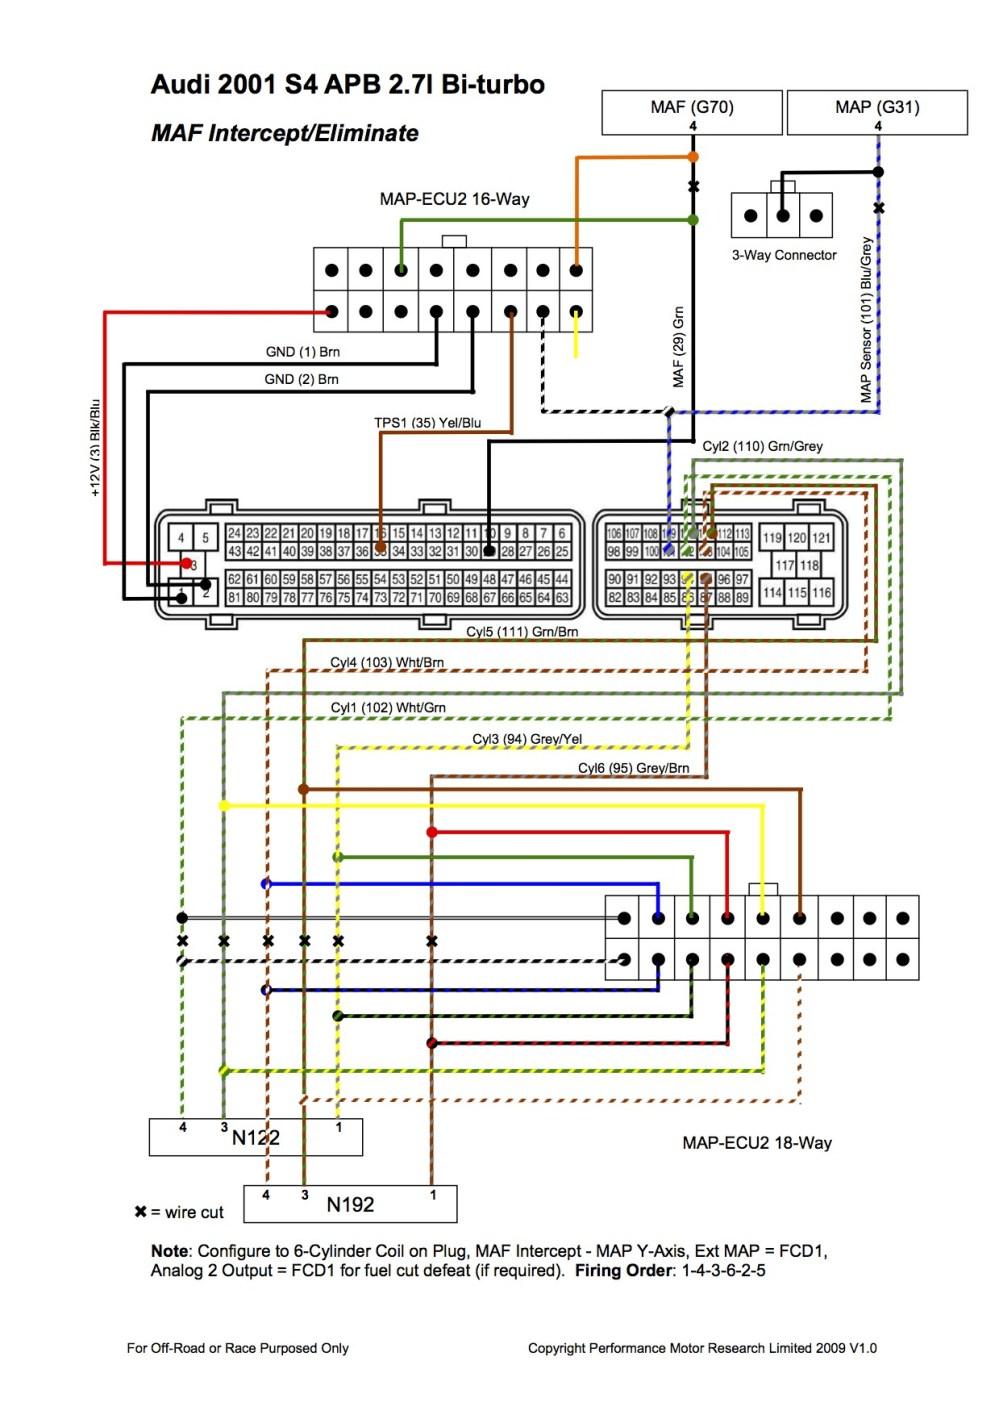 medium resolution of detroit series 60 ecm wiring diagram detroit diesel series 60 ecm wiring diagram and wiring diagrams